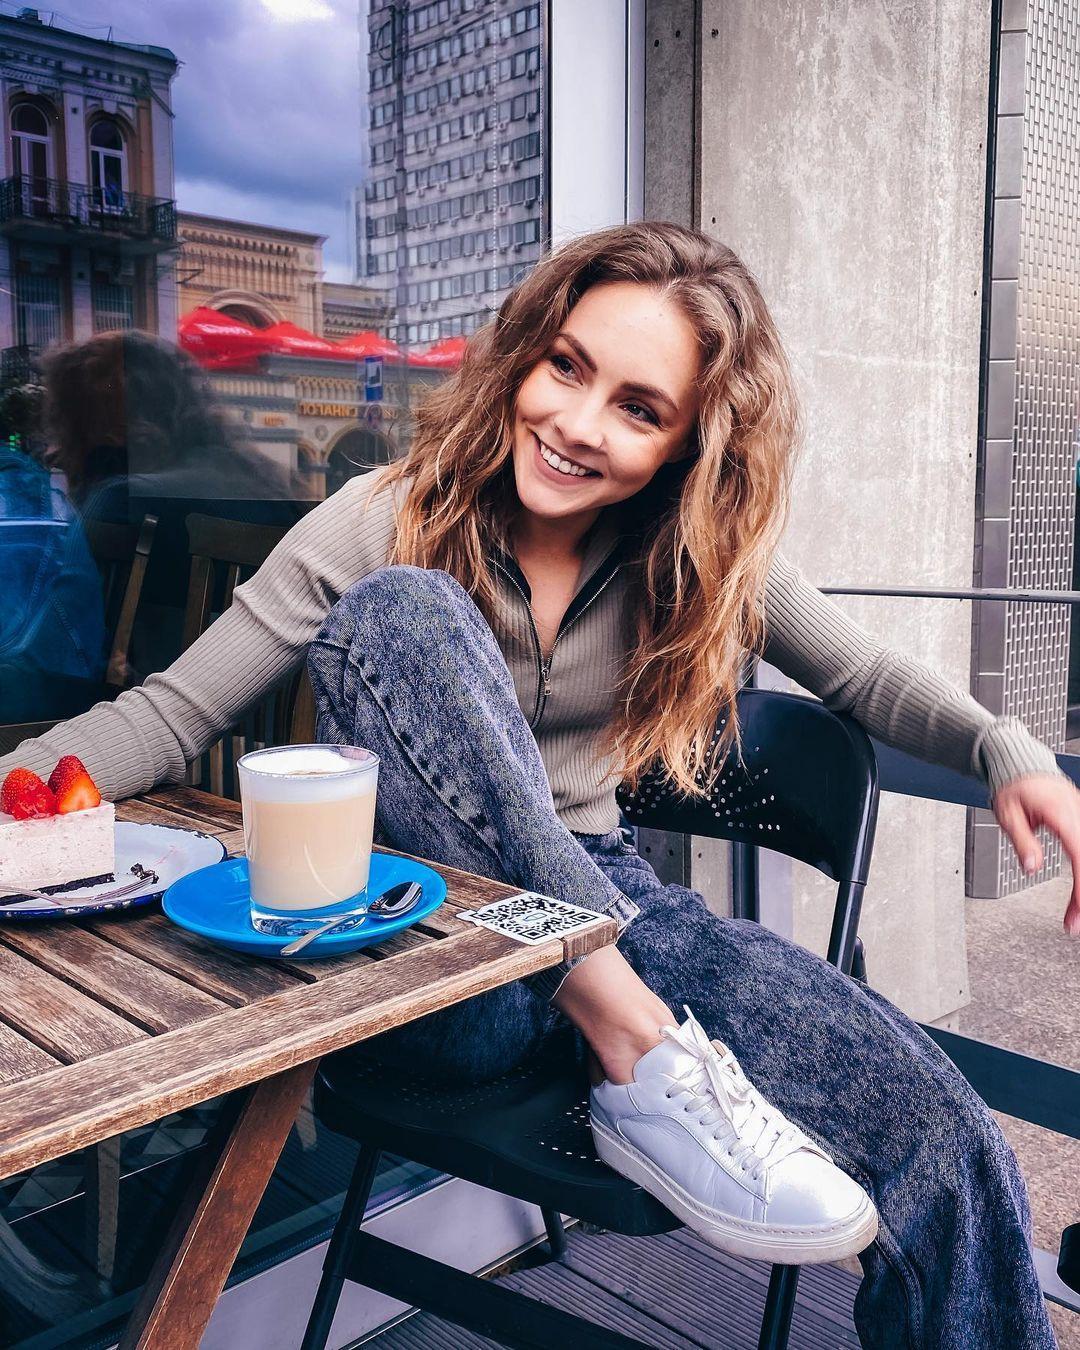 Шоптенко показала фото / instagram.com/alena_shoptenko